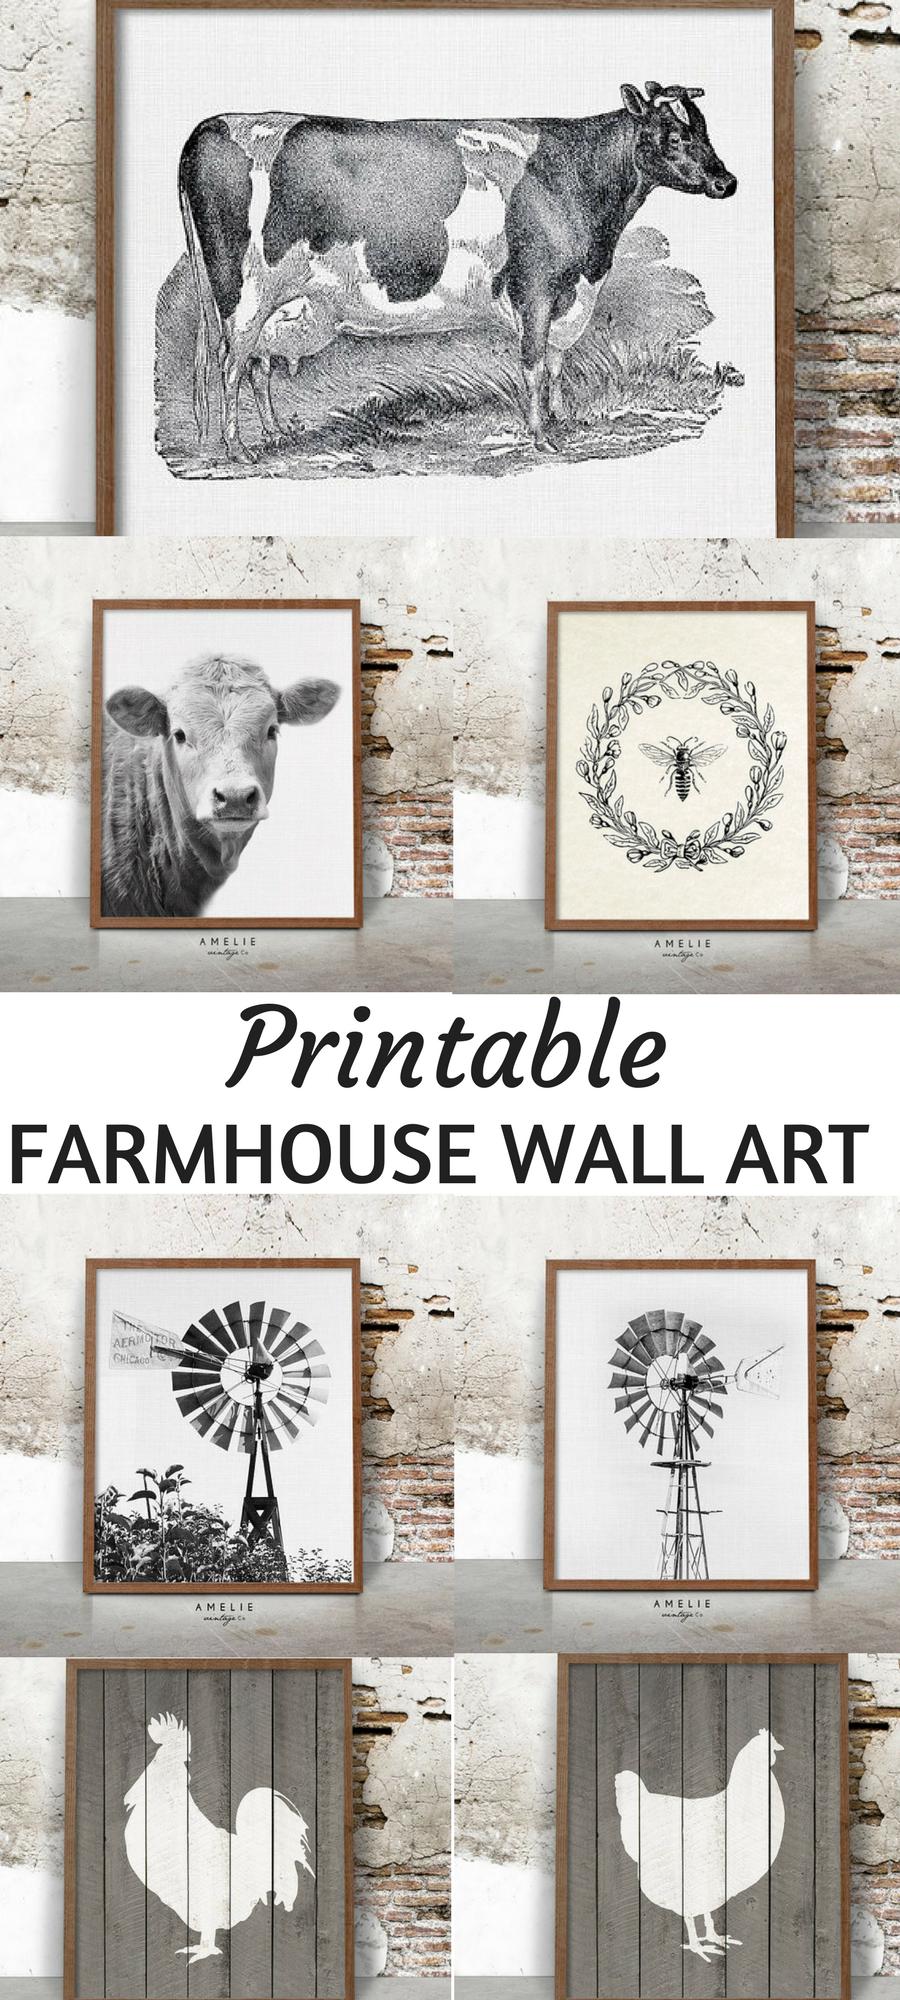 rustic printable farmhouse wall art home decor wall on wall art for home id=95138